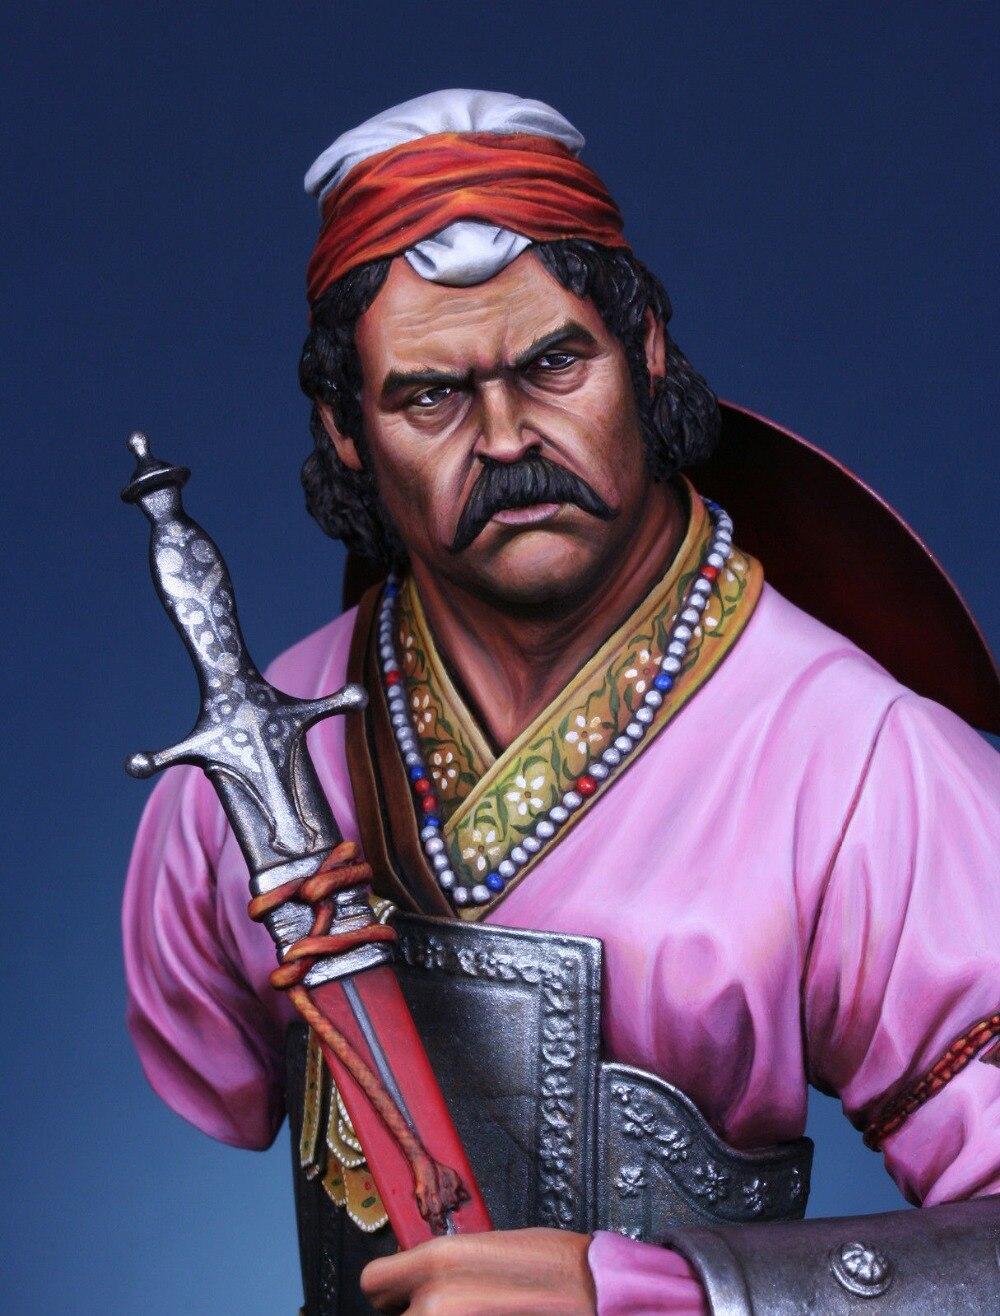 e2f220d35 Sem pintura Kit 1 10 Moghul Da SEGUNDA GUERRA MUNDIAL soldado Guerreiro  busto Figura Resina